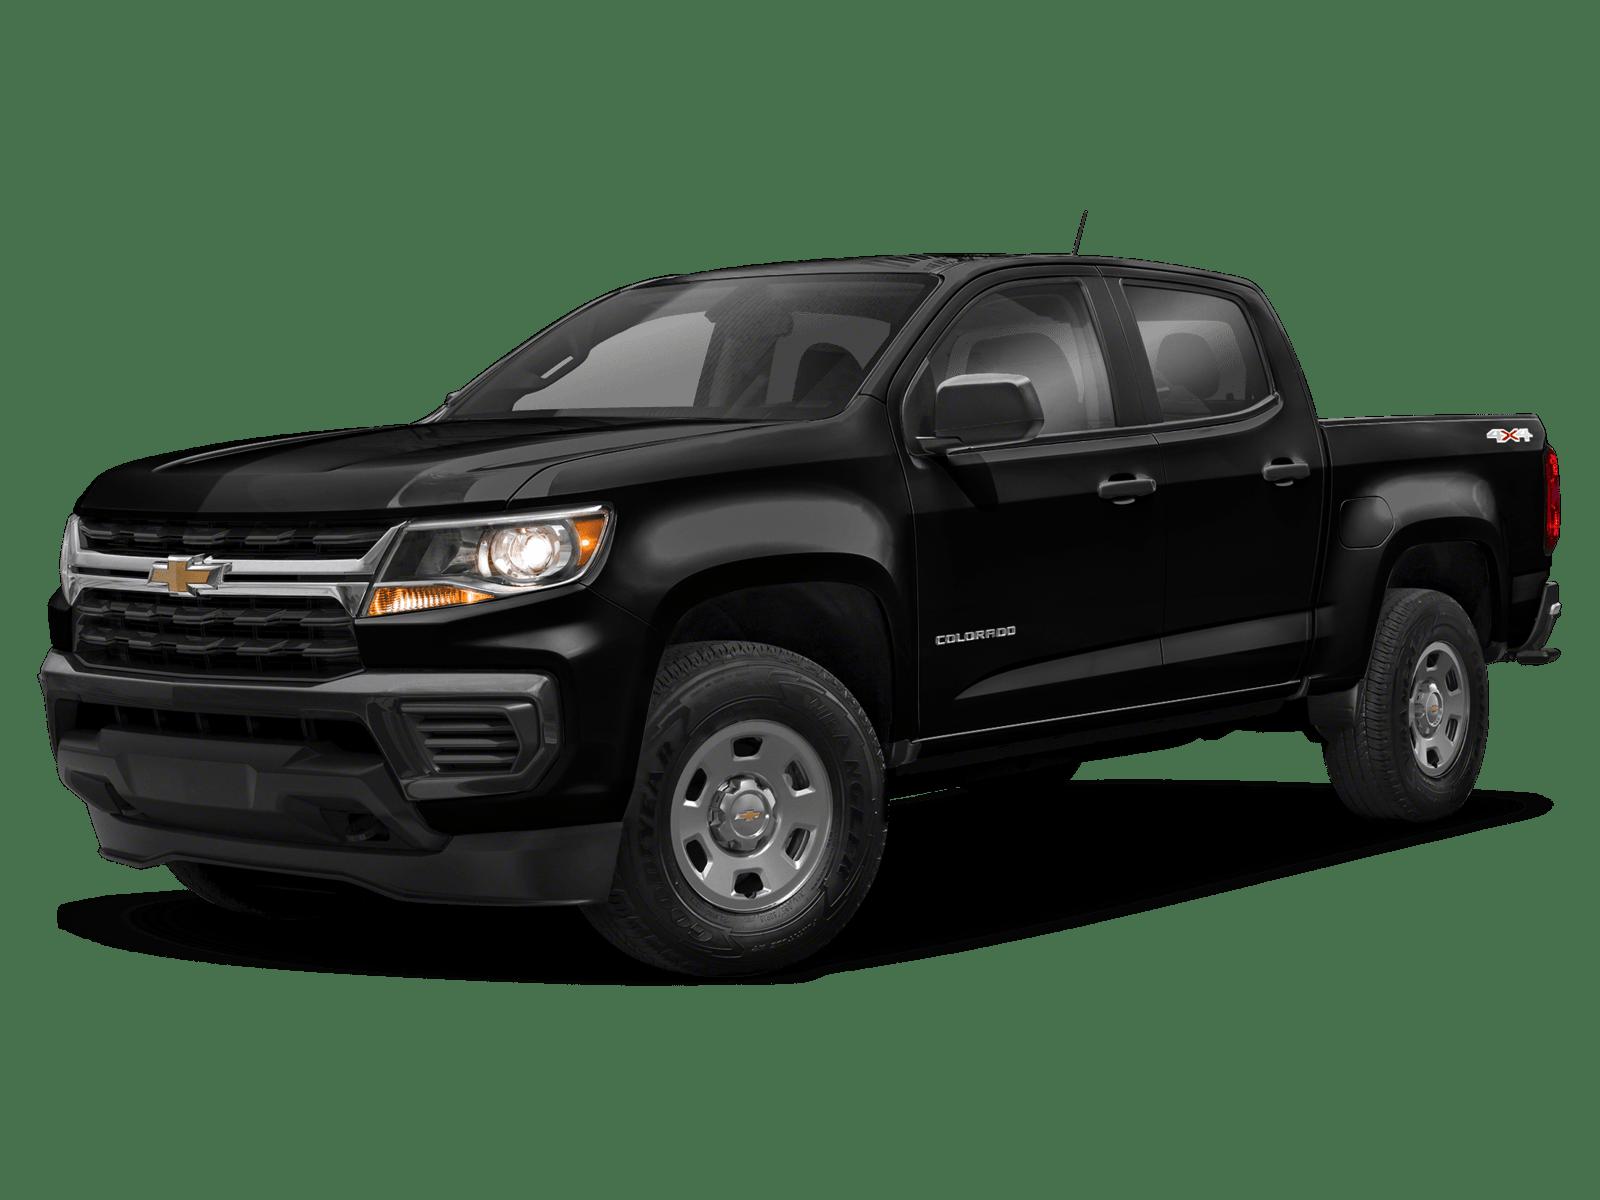 2021 chevrolet colorado | birchwood automotive group